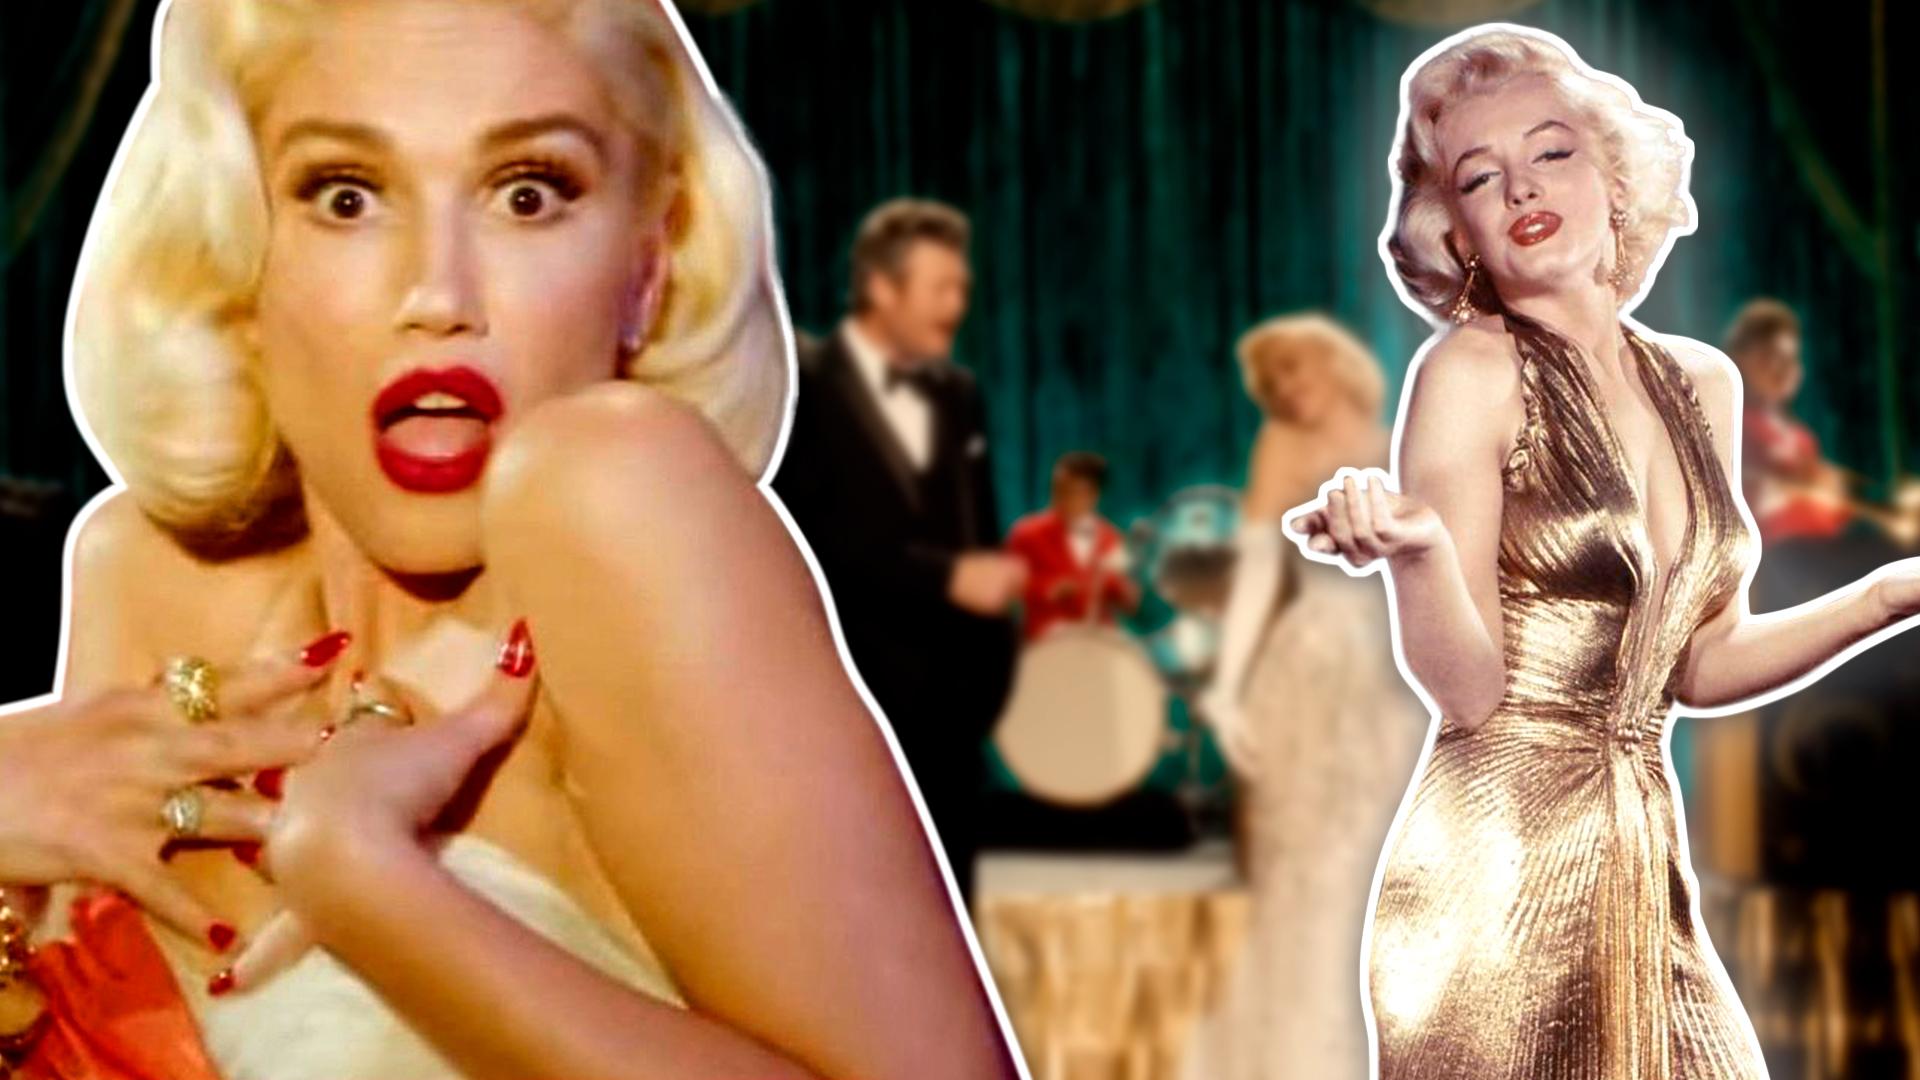 Gwen Stefani se convierte en Marilyn Monroe para un video navideño